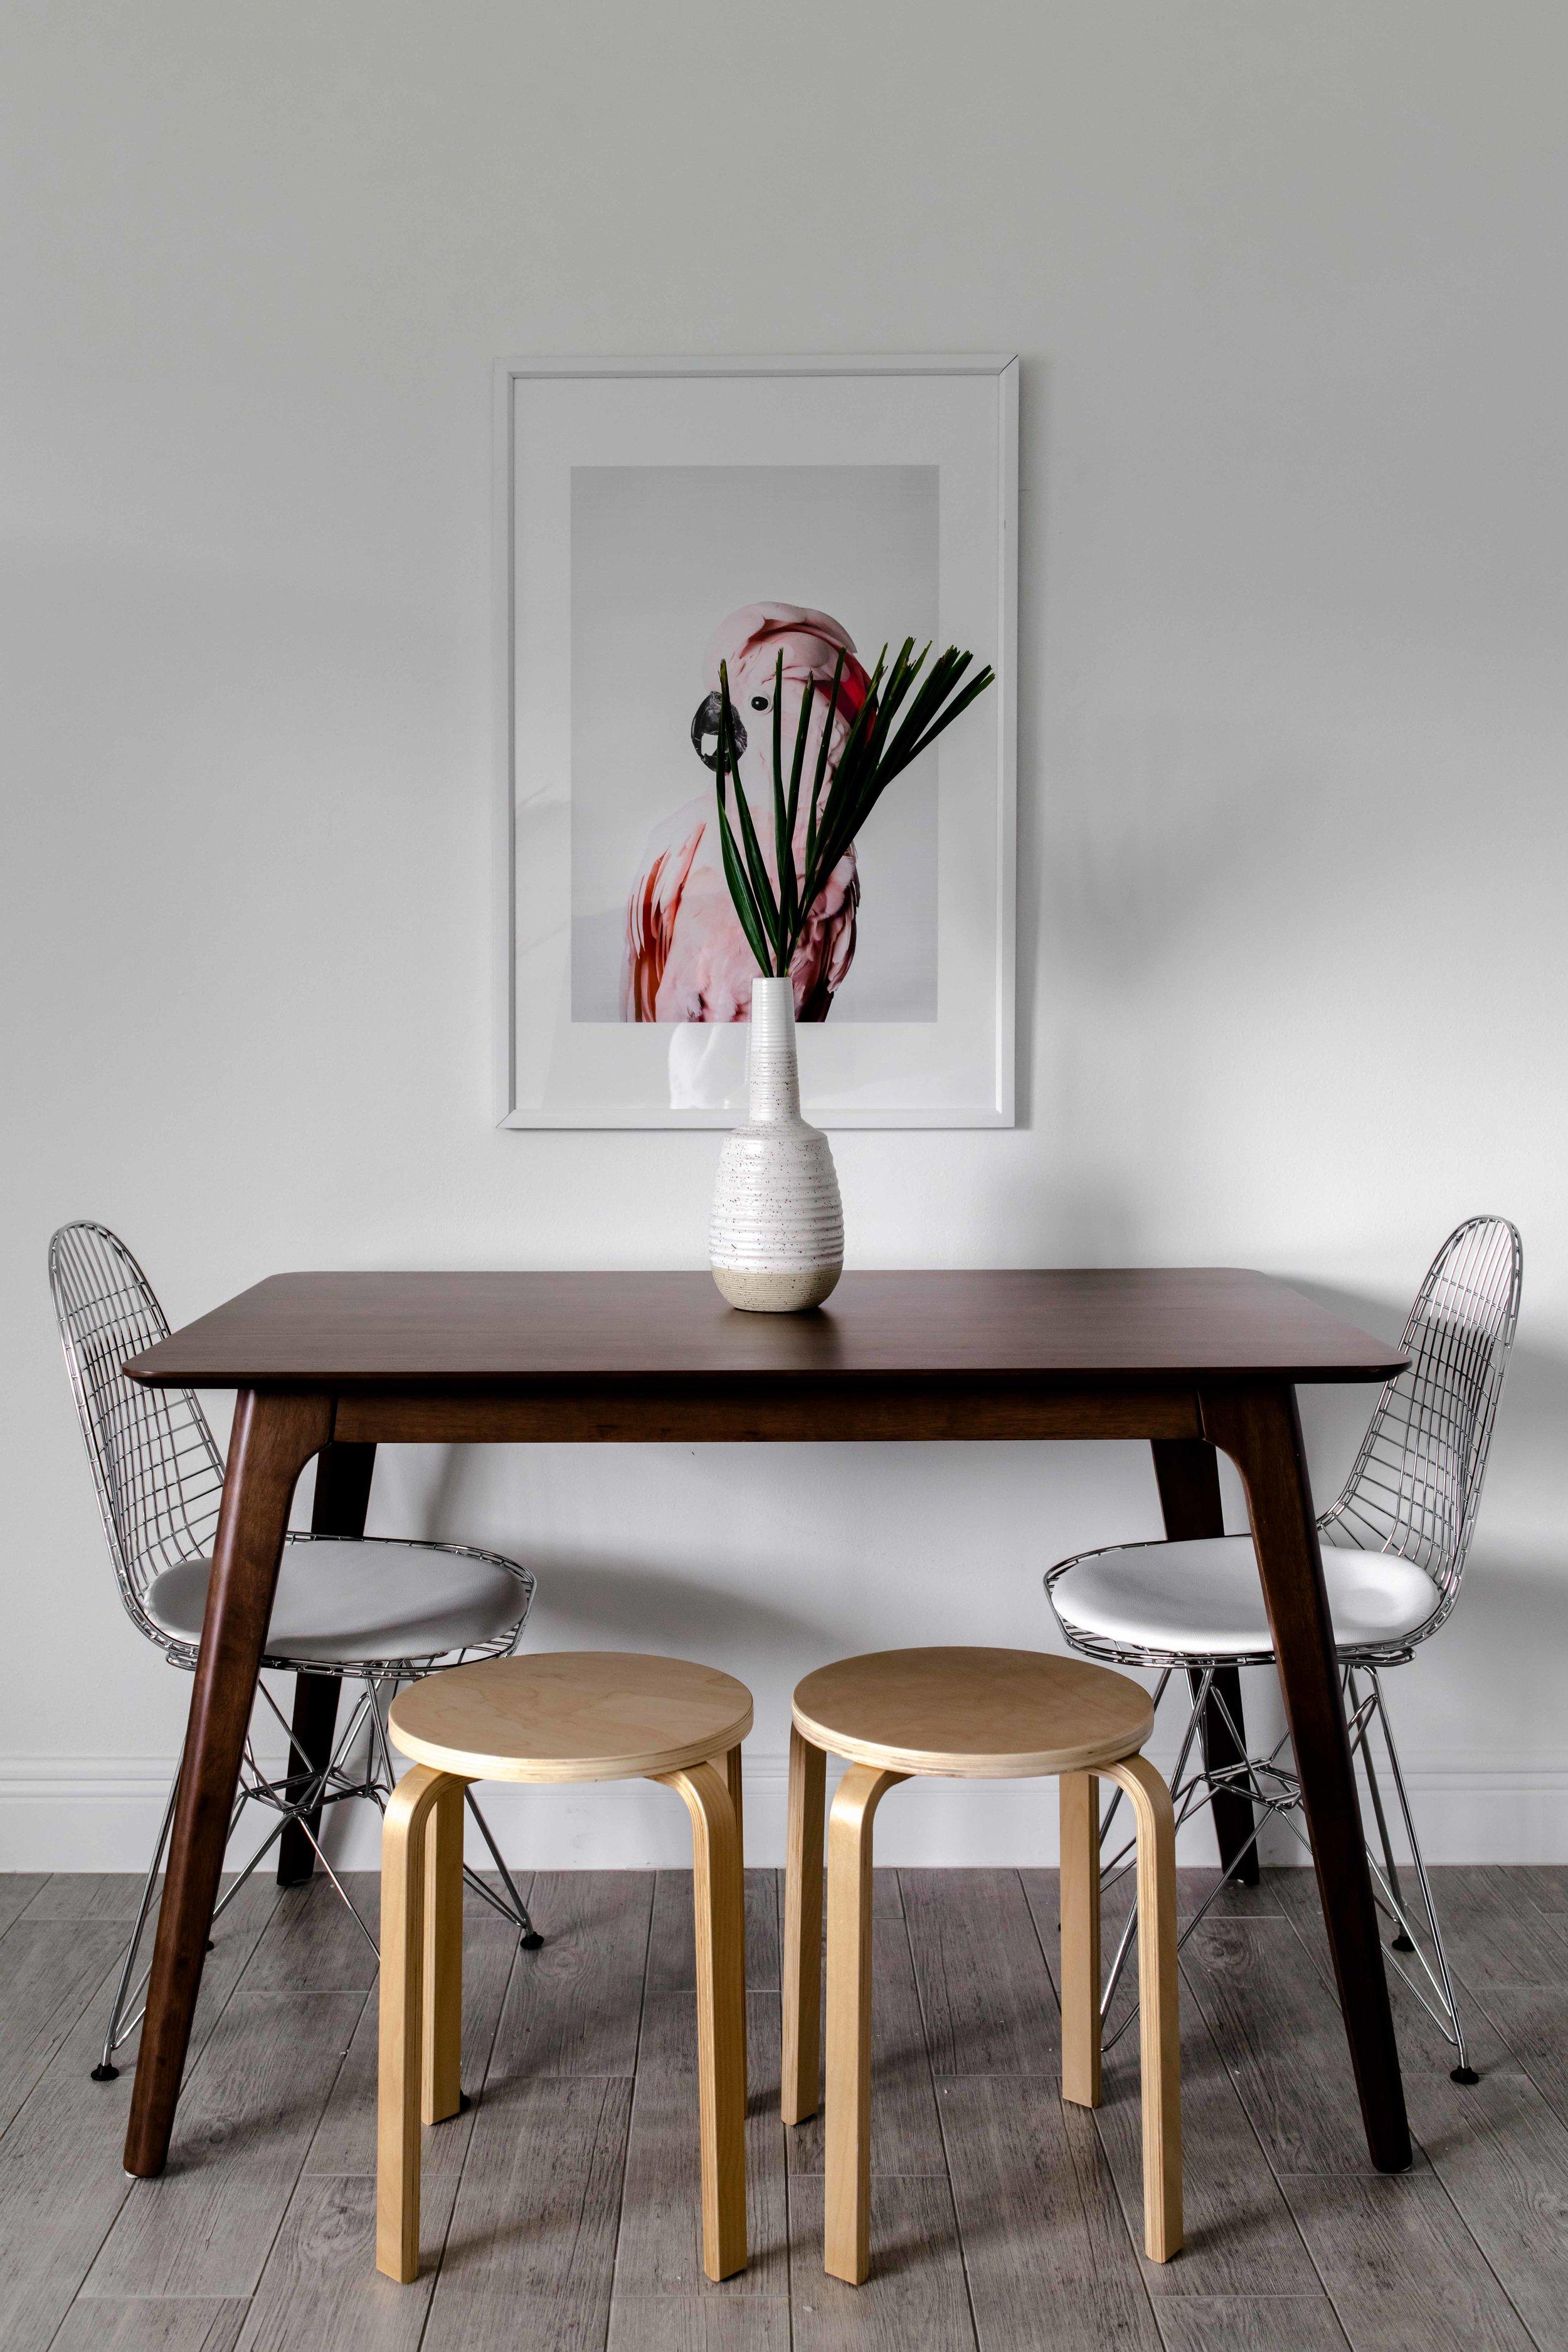 Sonder Stays Miami Interior Design Photographer Lifestyle Home Interiors Photography-4.jpg